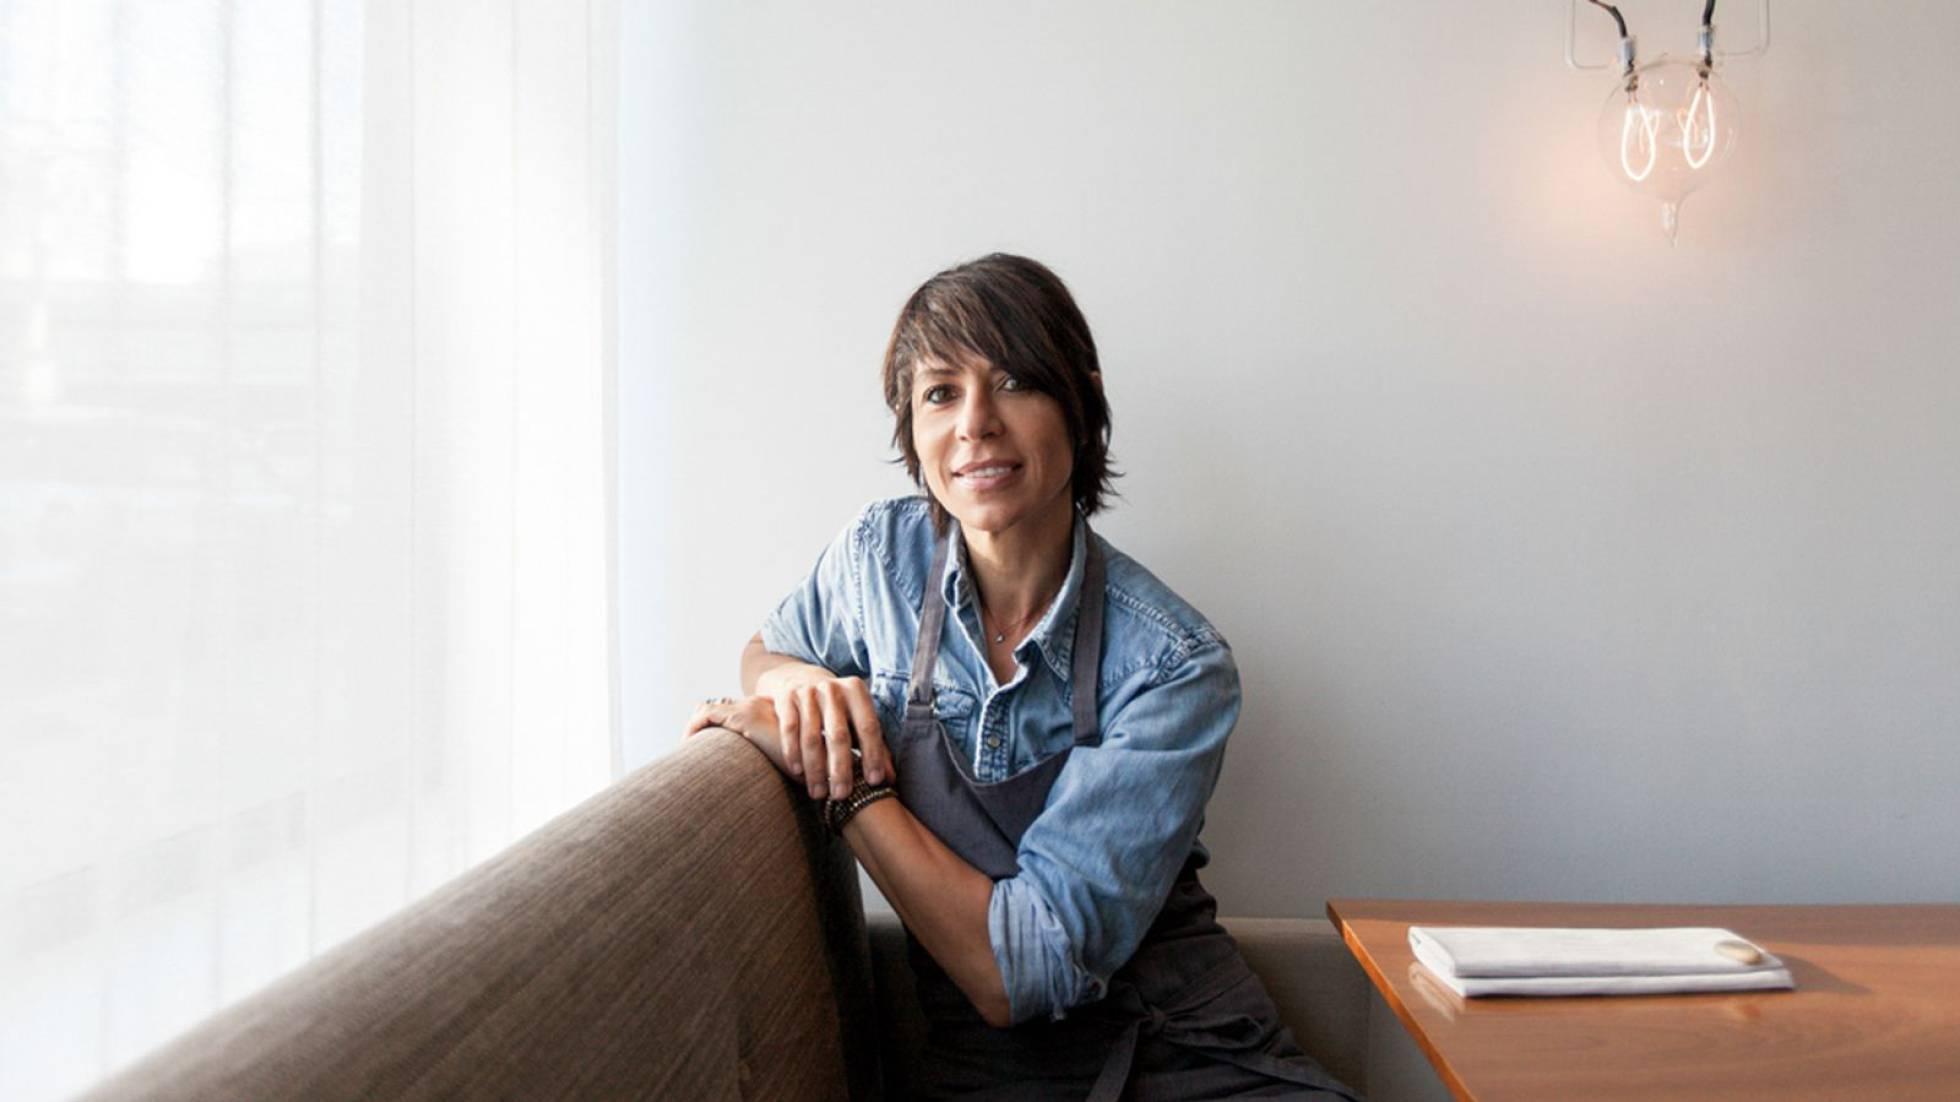 Dominique Crenn, mejor cocinera del mundo